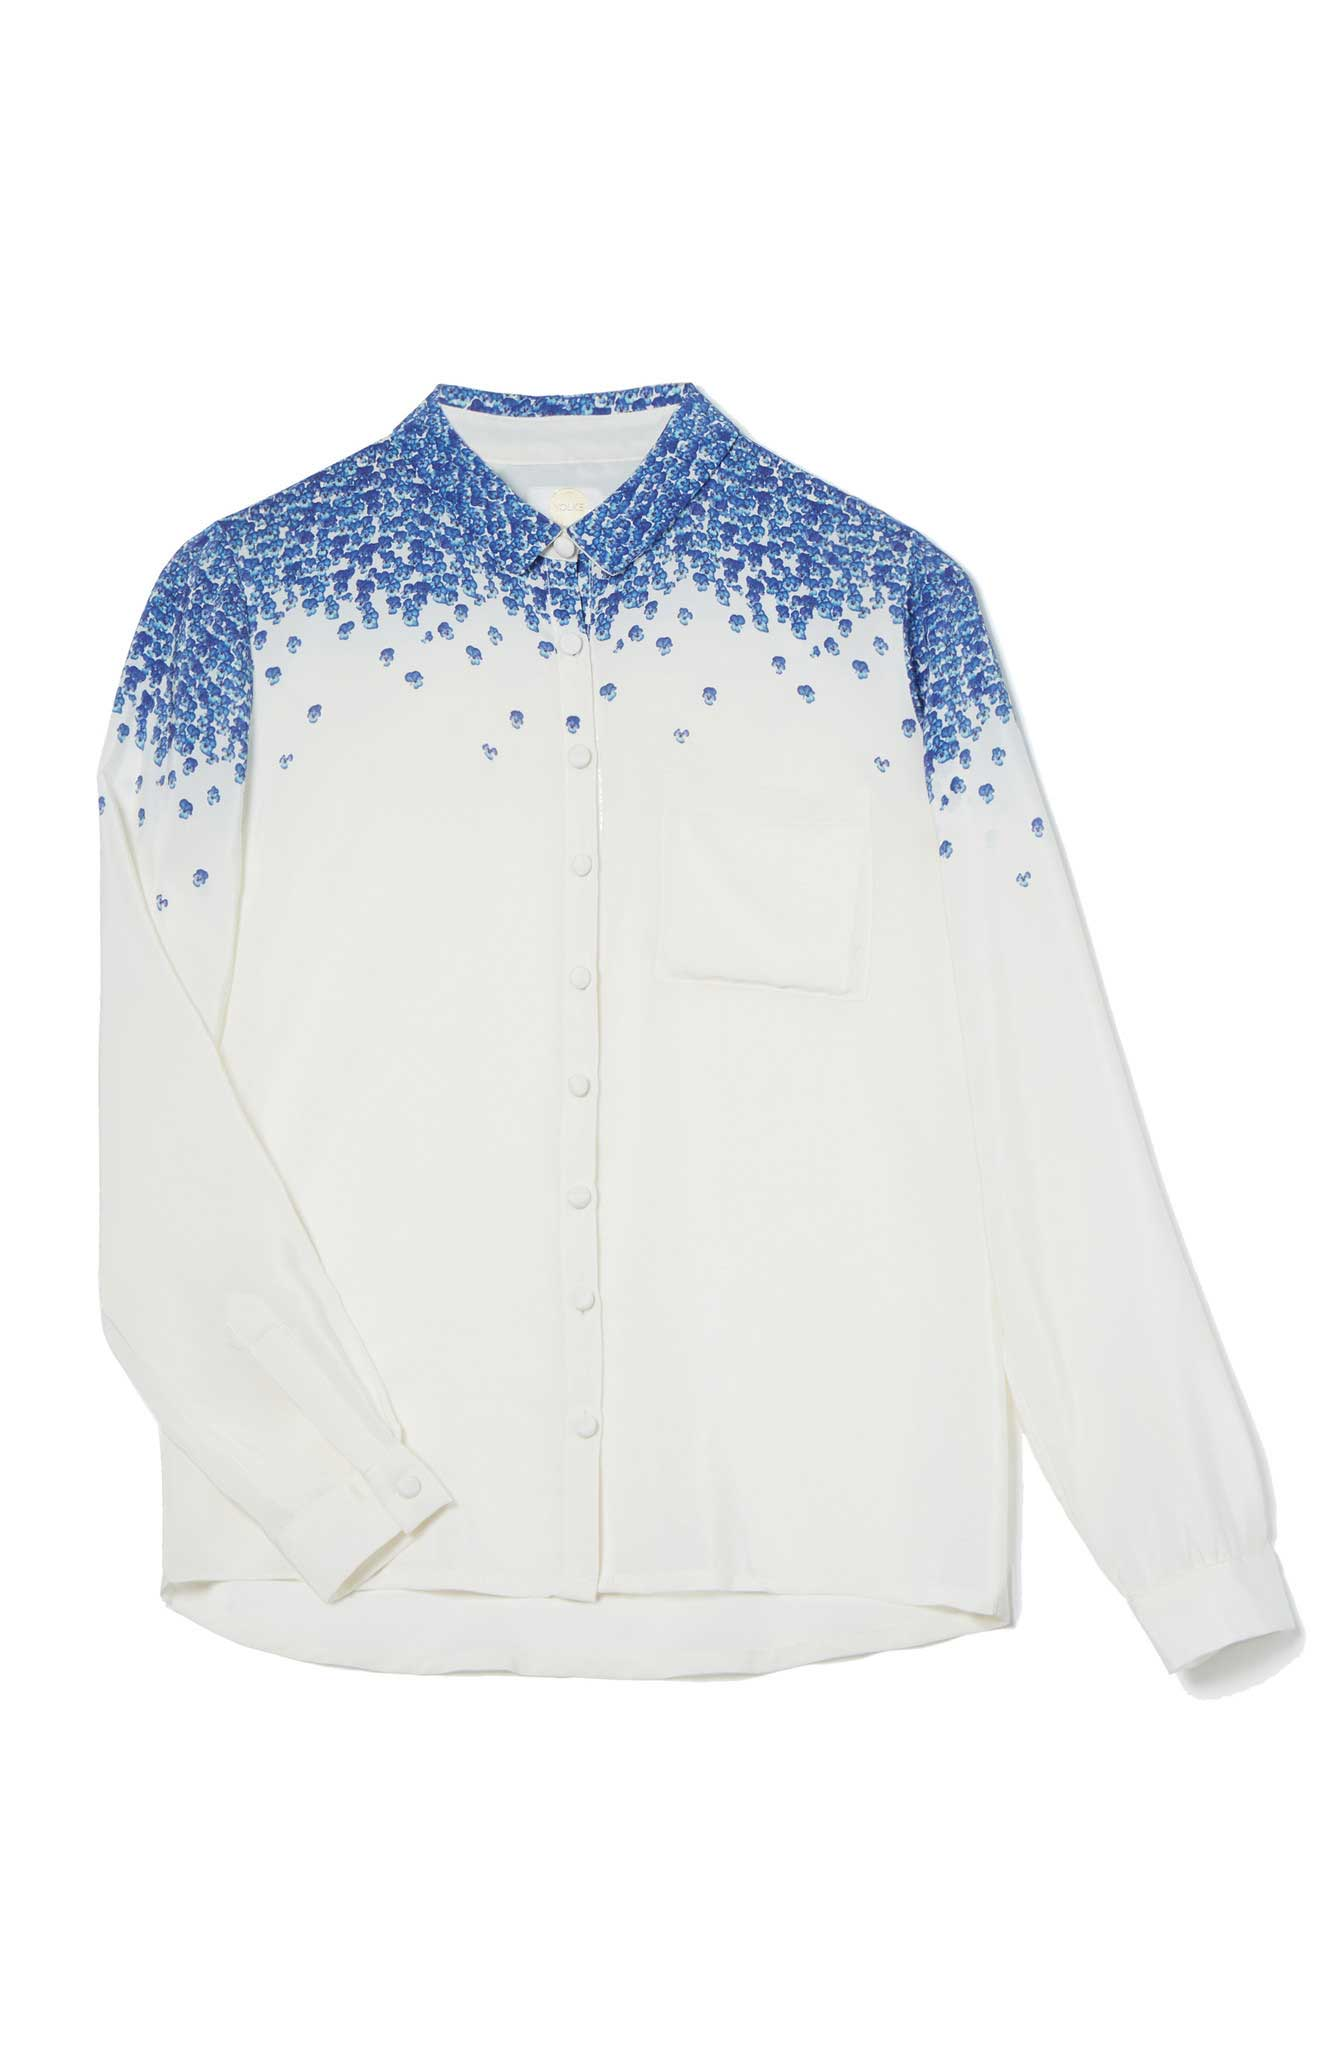 Nashville Silk Shirt Ice, £175, Yolke. www.yolke.co.uk